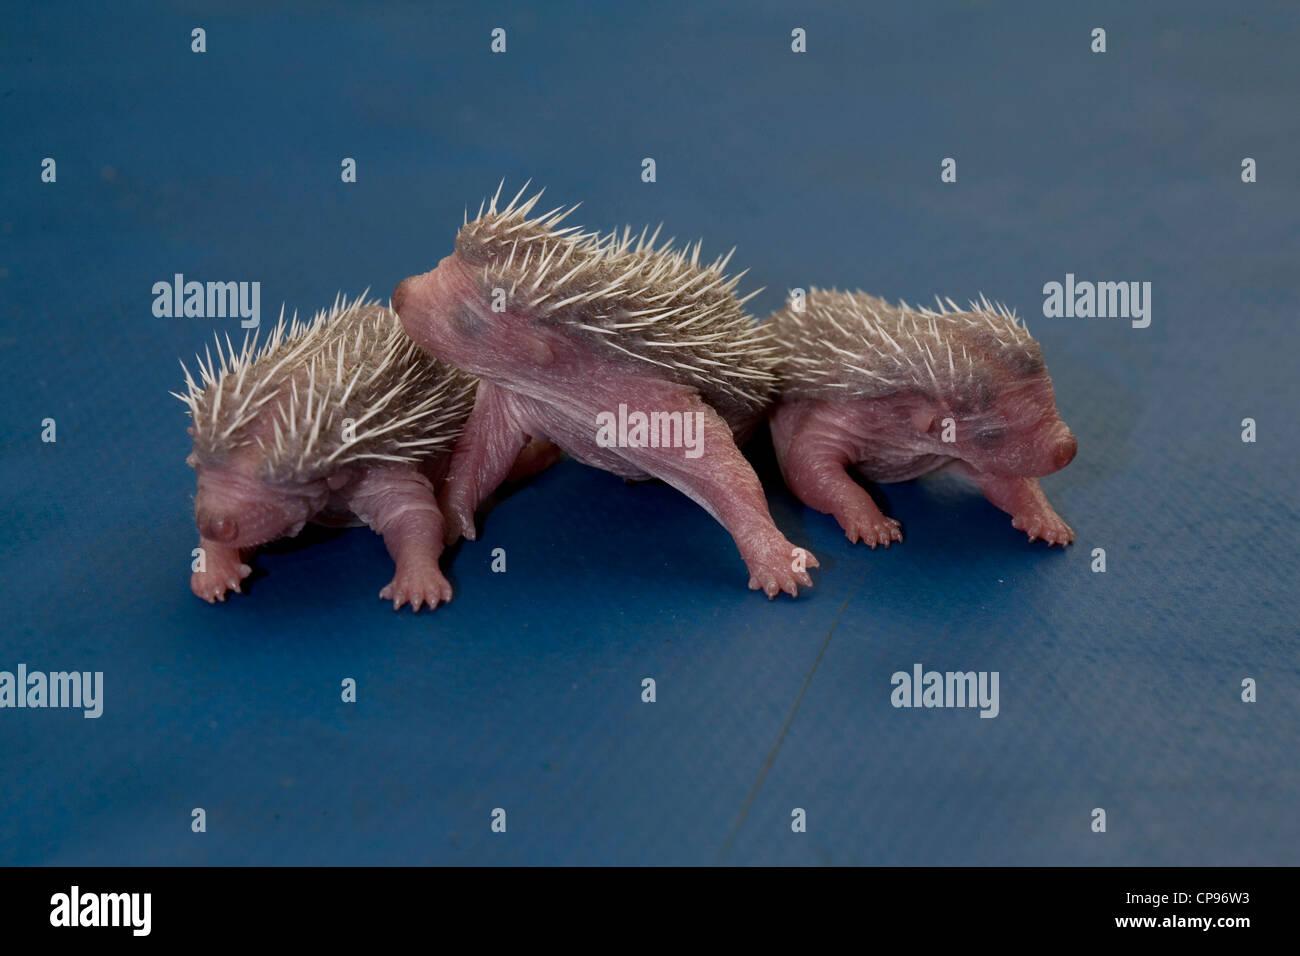 Three Baby Hedgehogs - Stock Image